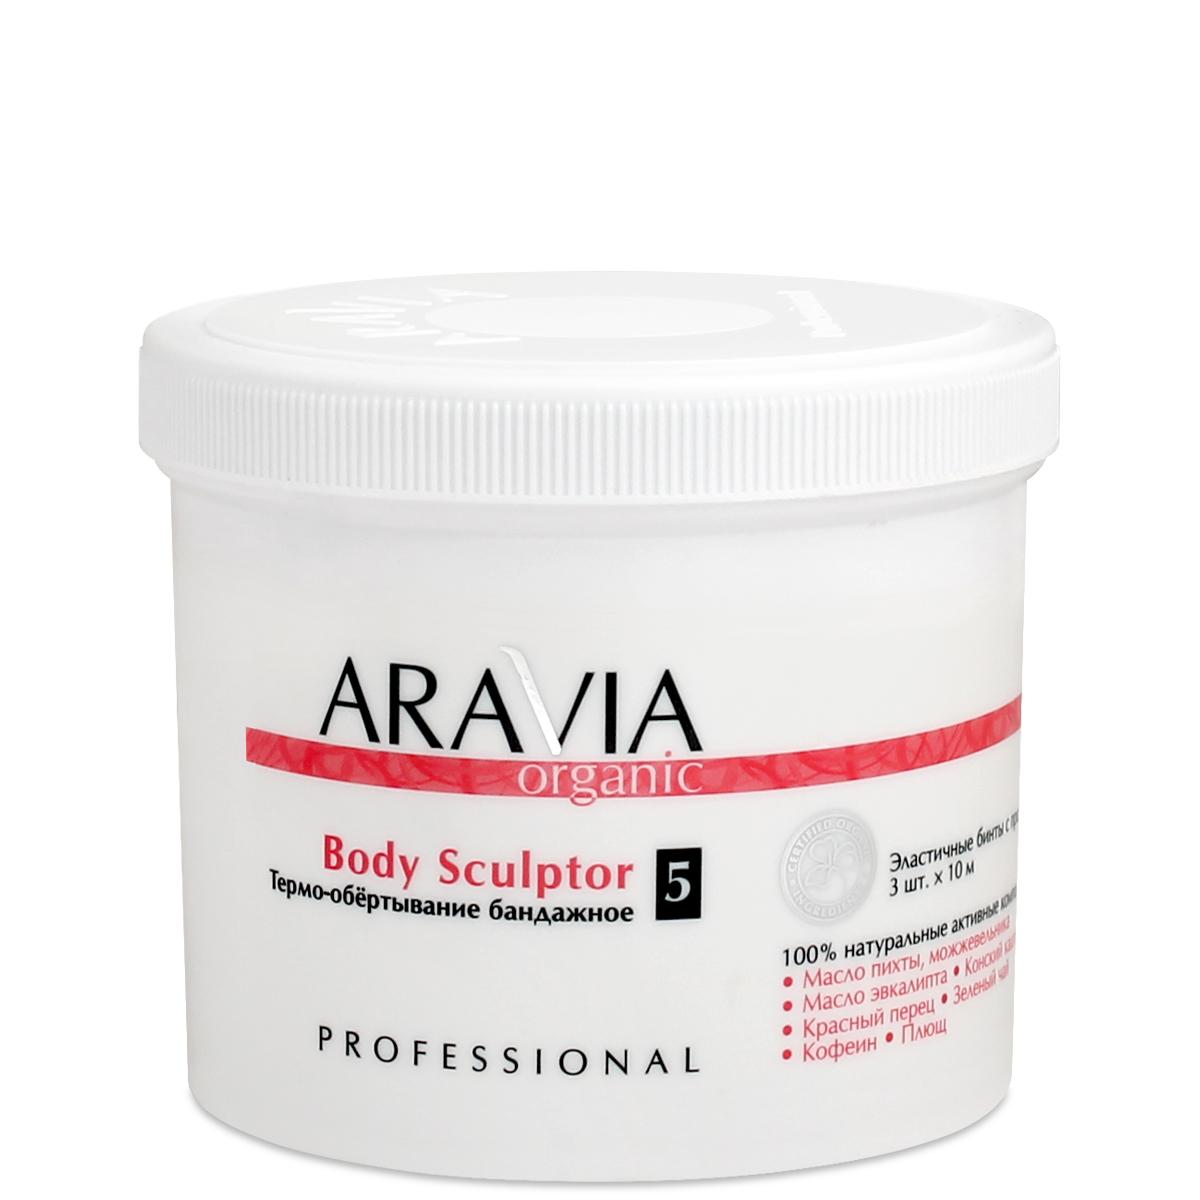 ARAVIA Термо-обертывание бандажное  Body Sculptor  / ARAVIA Organic 3 шт х10 мл